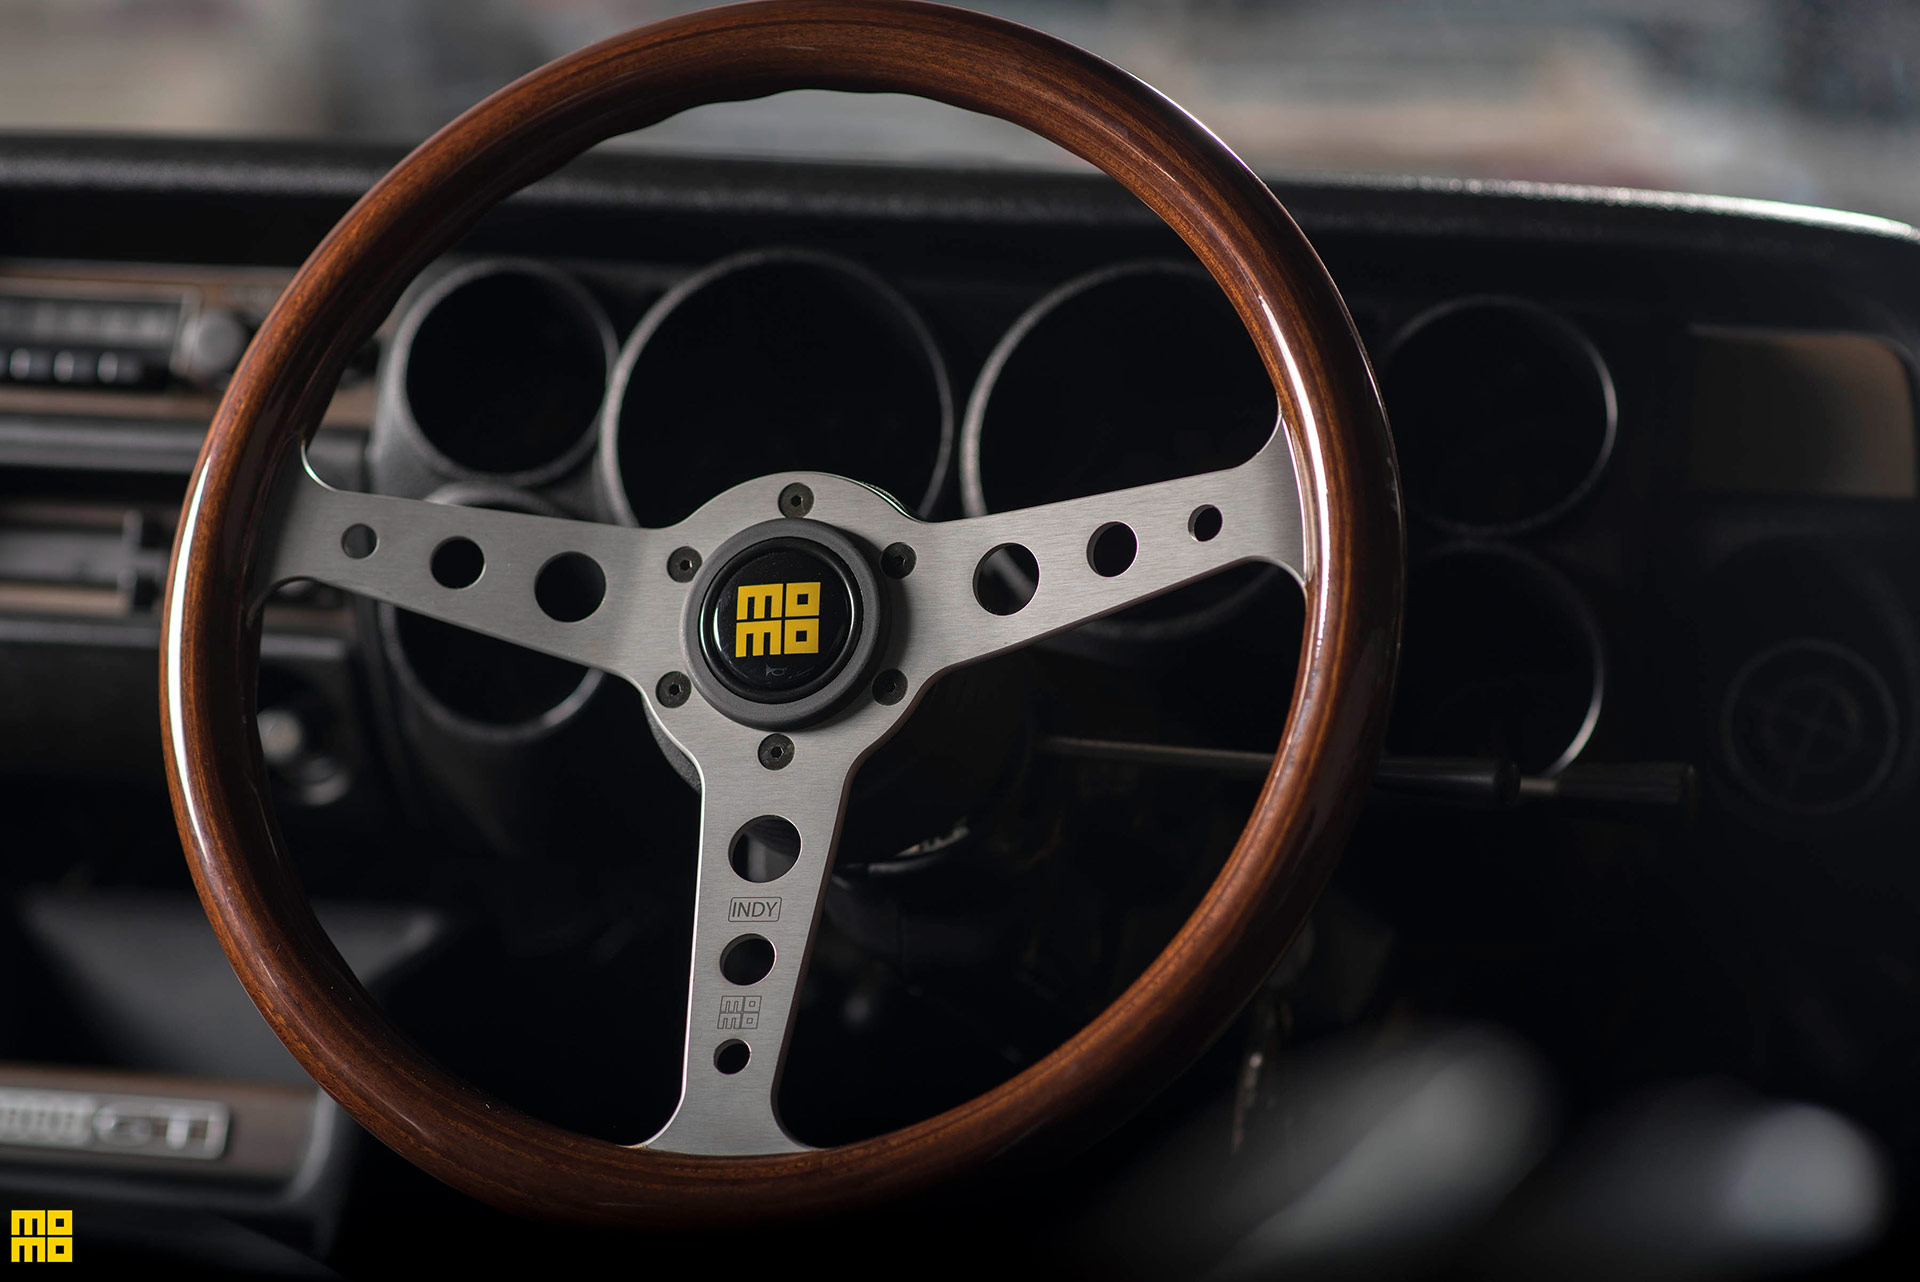 Nissan Hakosuka Skyline GTR - Momo Heritage Indy Steering Wheel